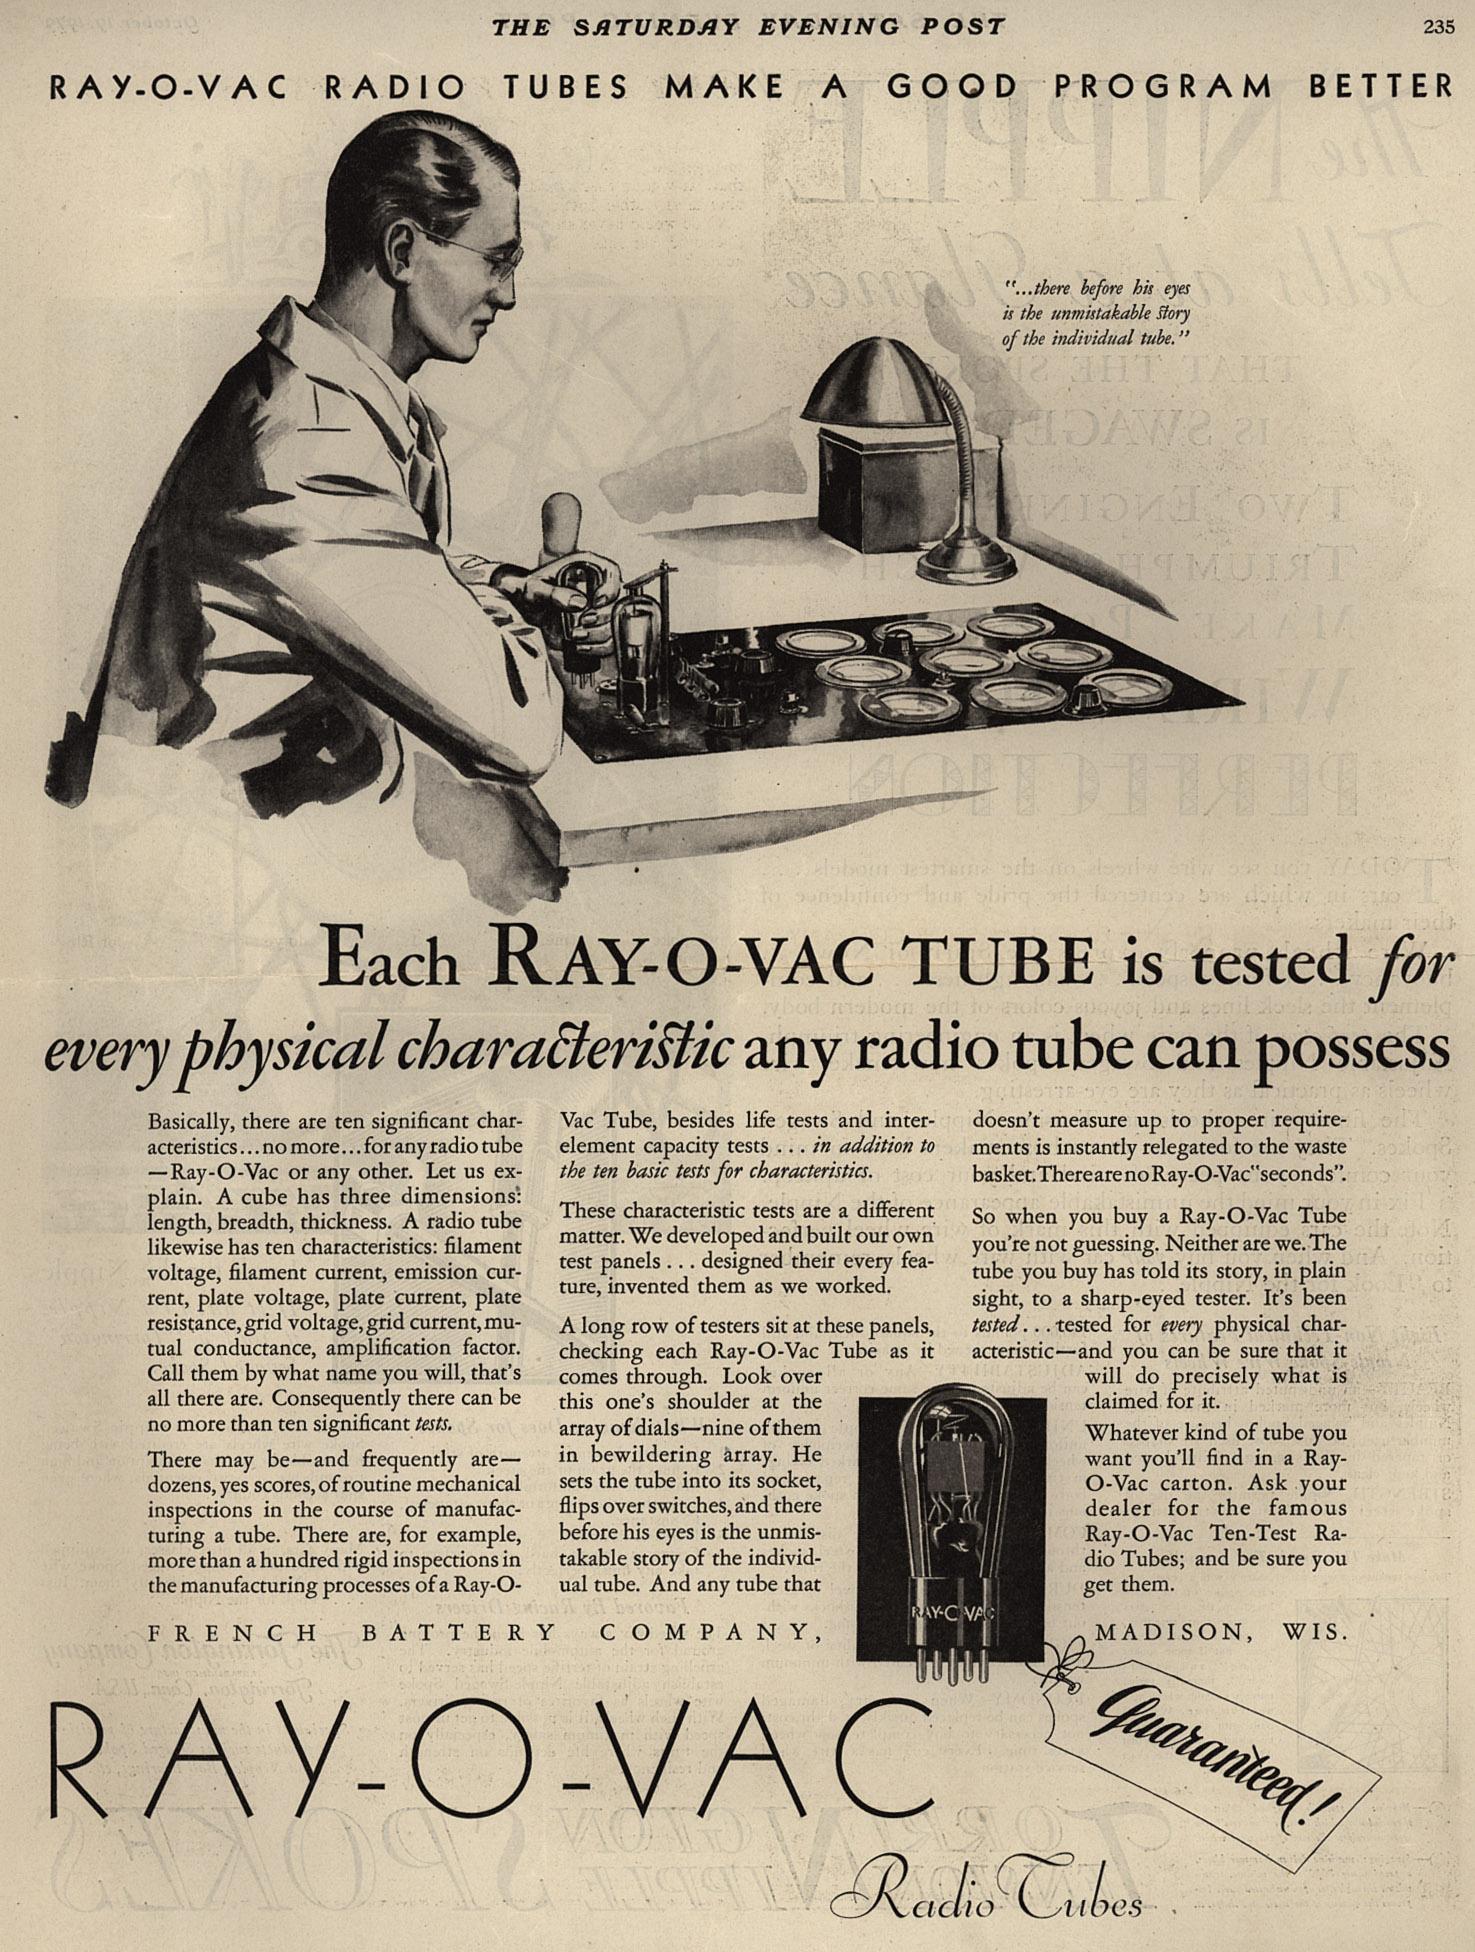 Ray-O-Vac_Radio_Tubes_Make_A_Good_Program_Better